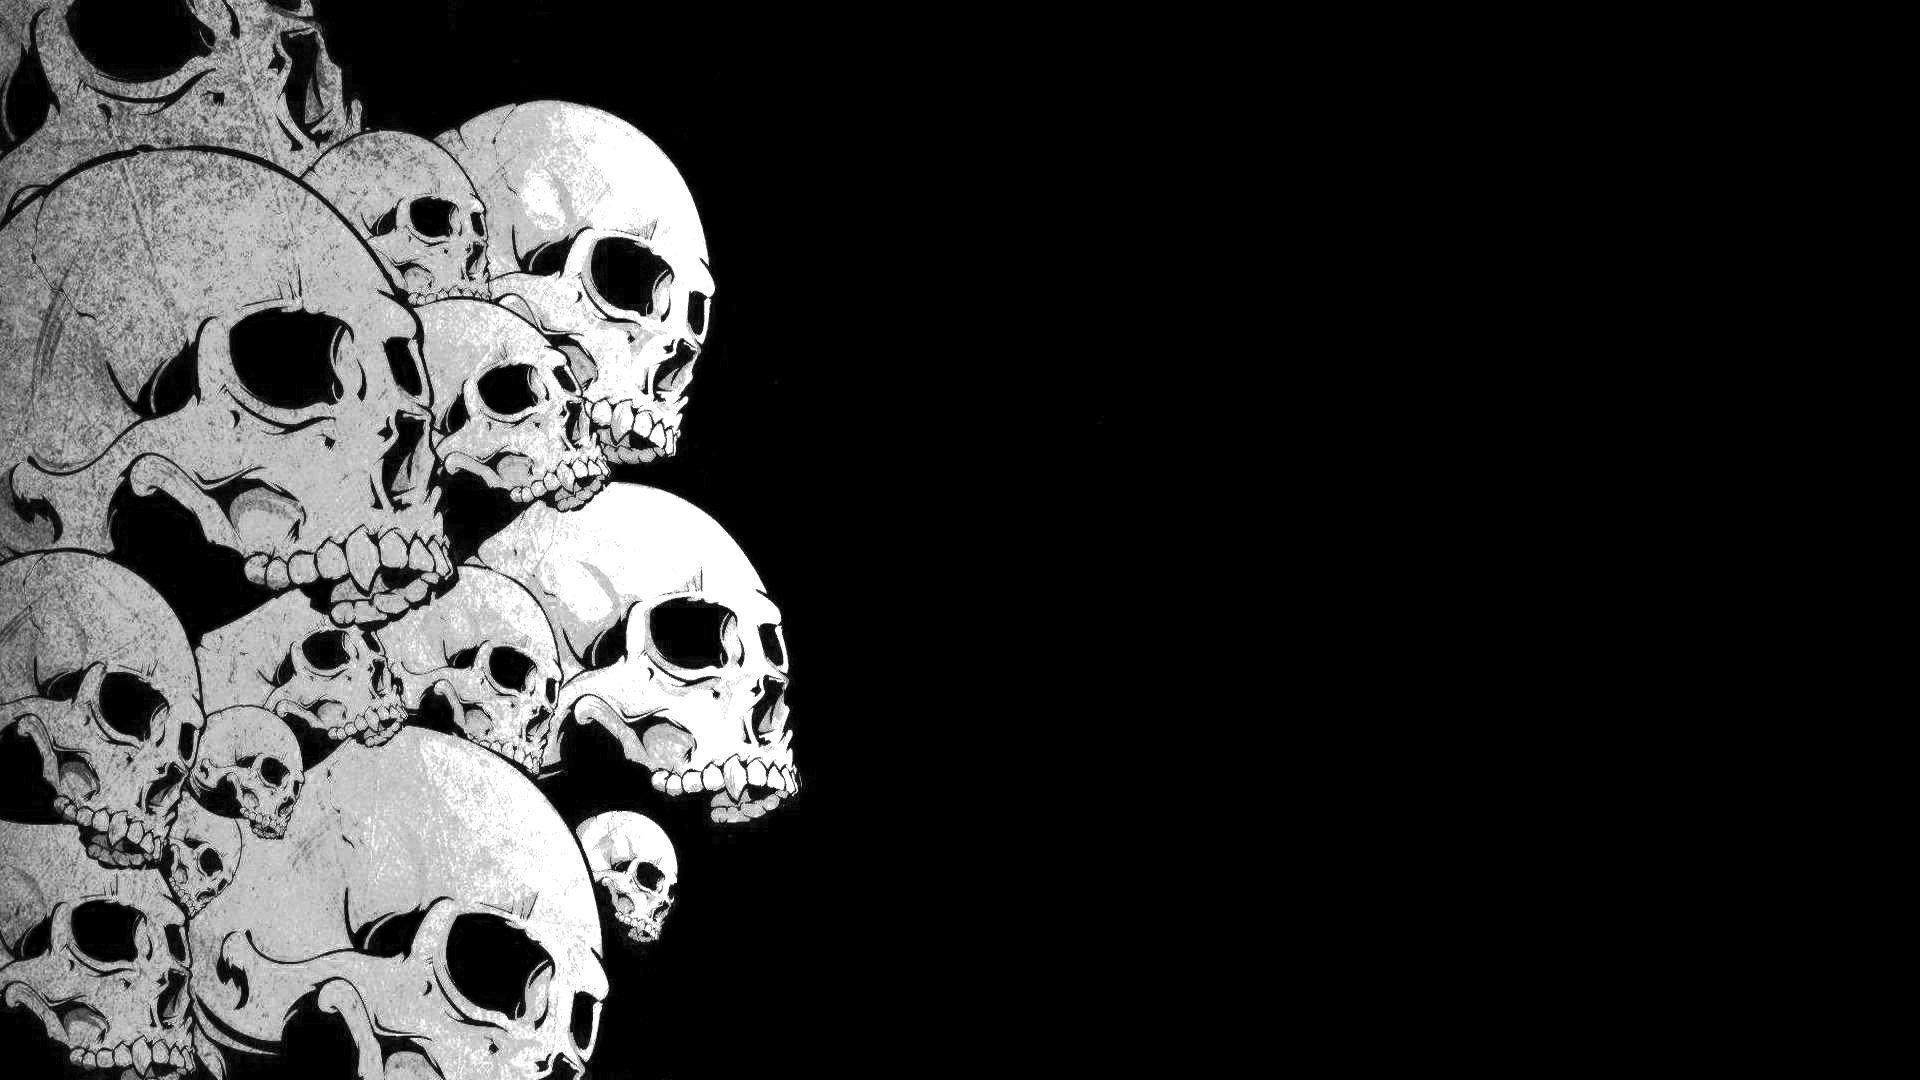 Free Skull Backgrounds 19374 1920x1080 Px Hdwallsource Com Skull Wallpaper Anime Wallpaper Hd Skull Wallpapers